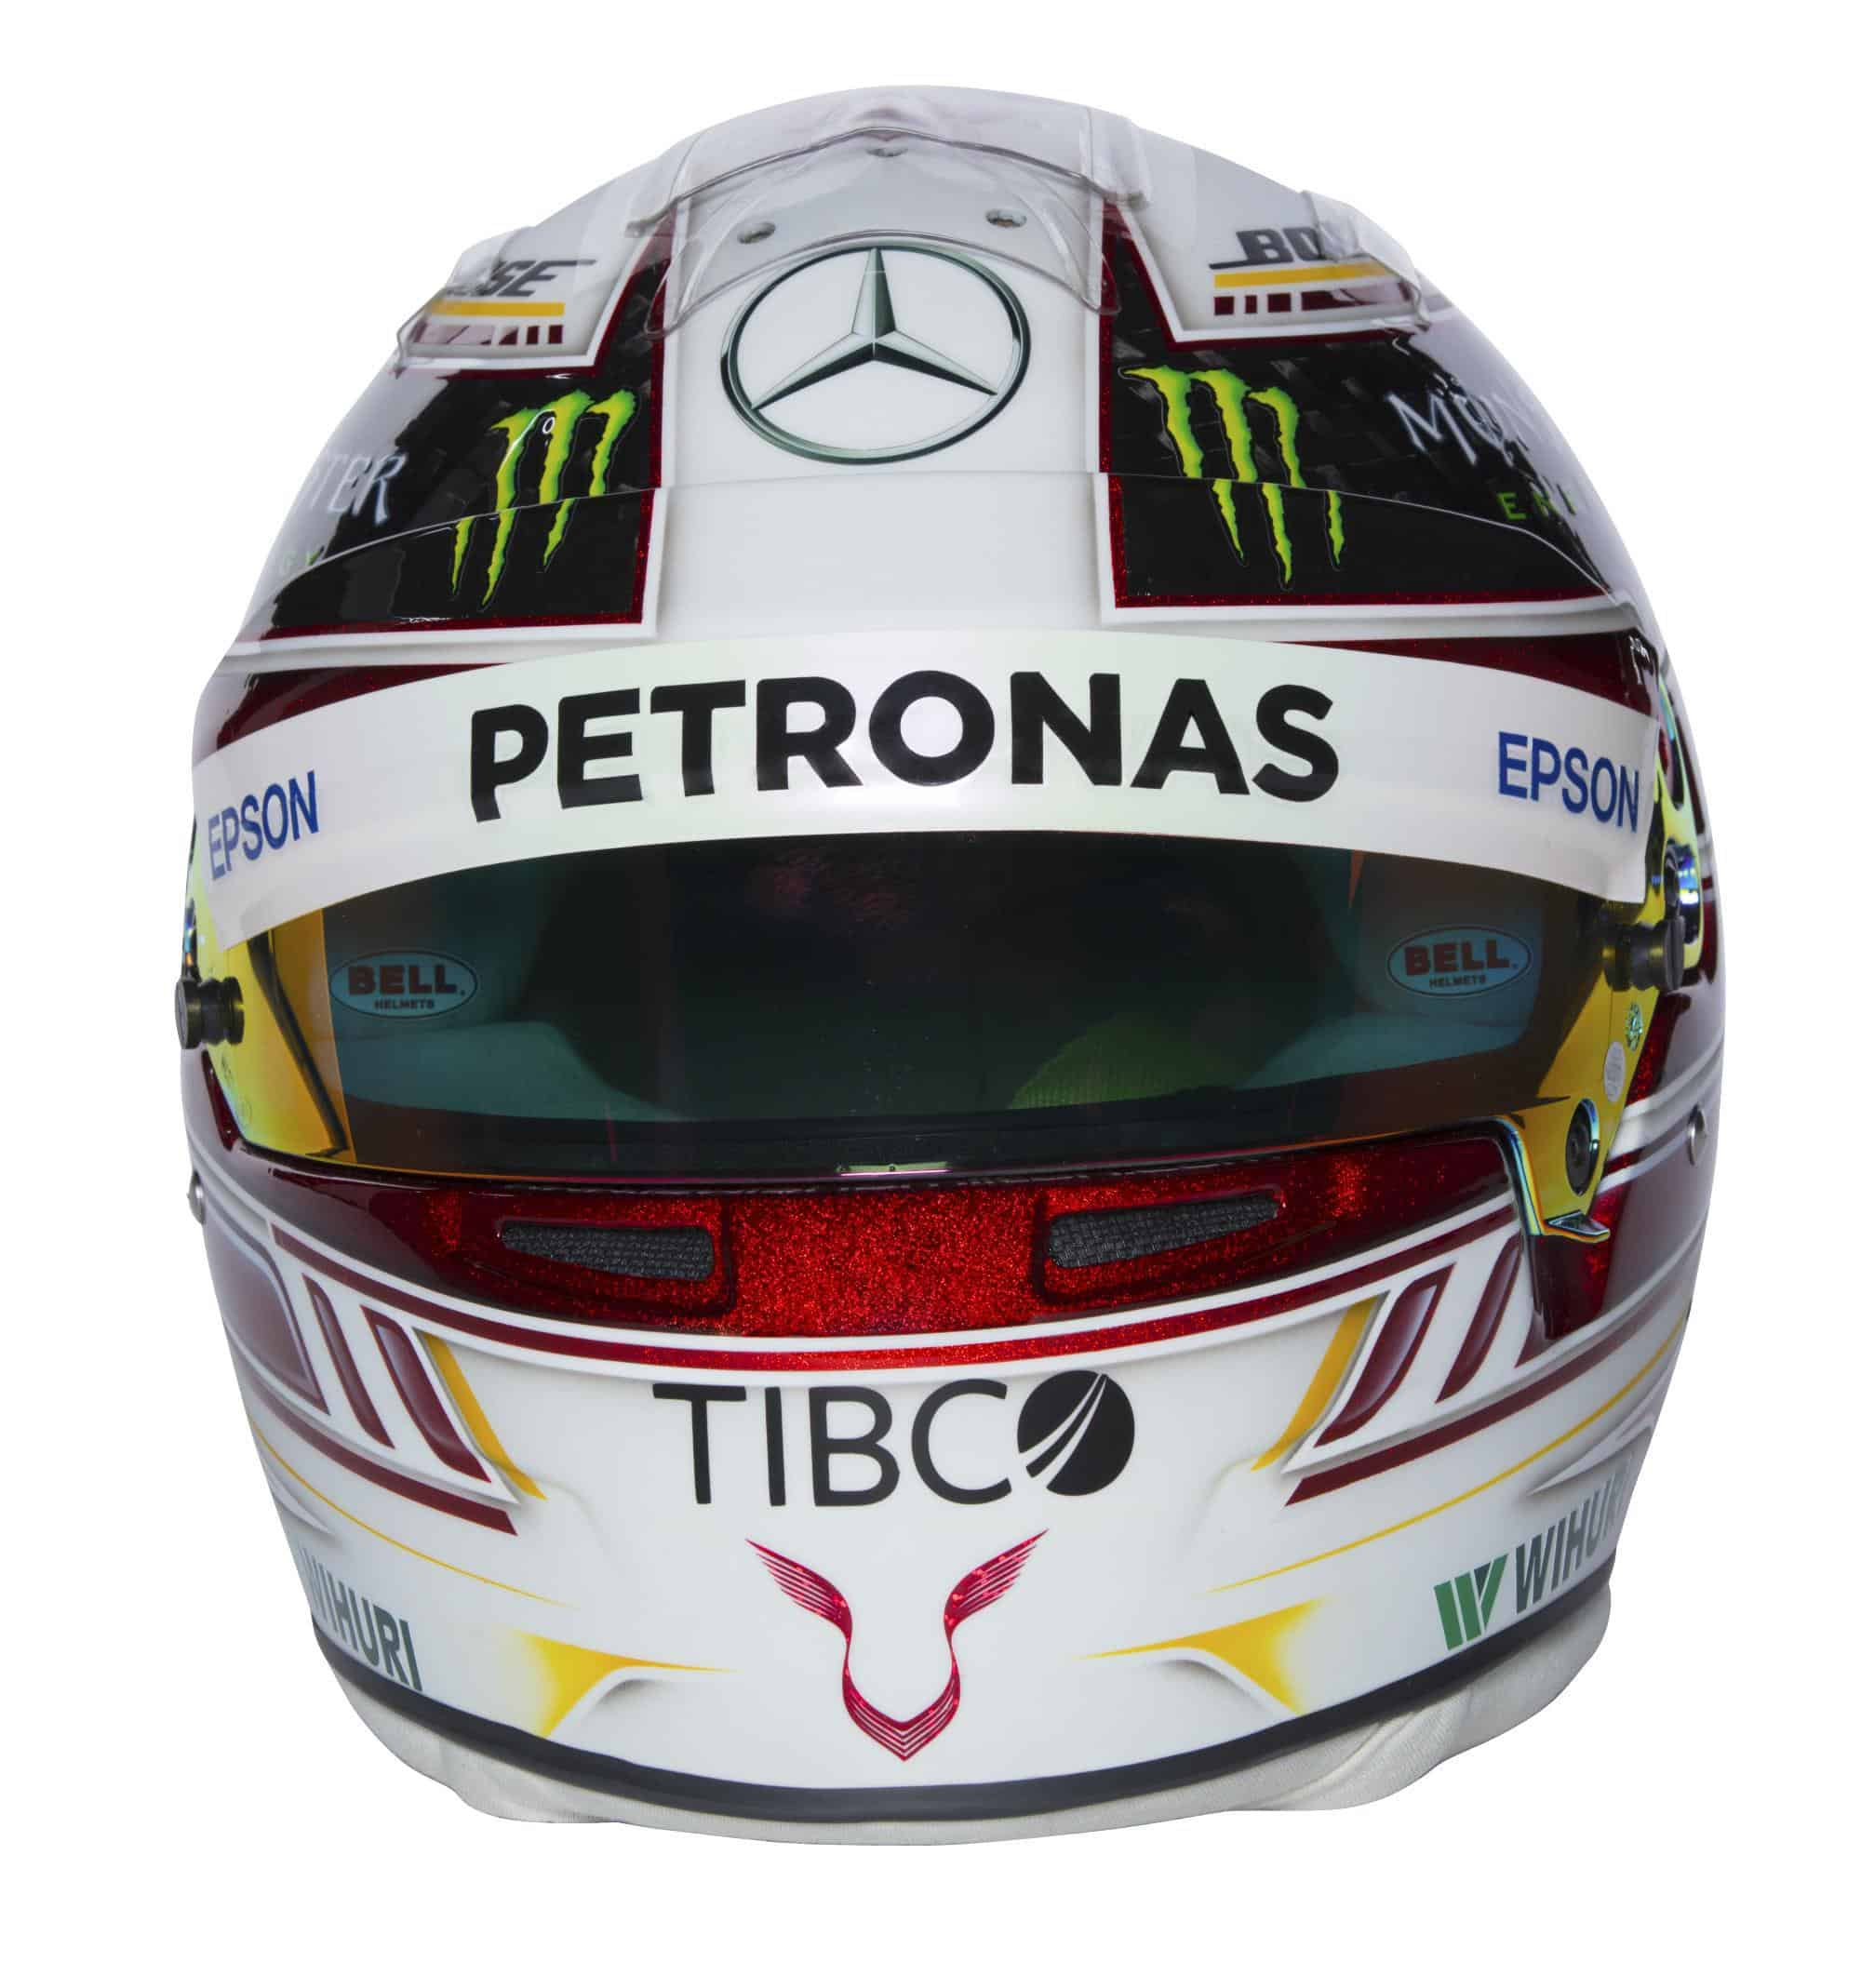 2018 Driver Helmets - Lewis Hamilton